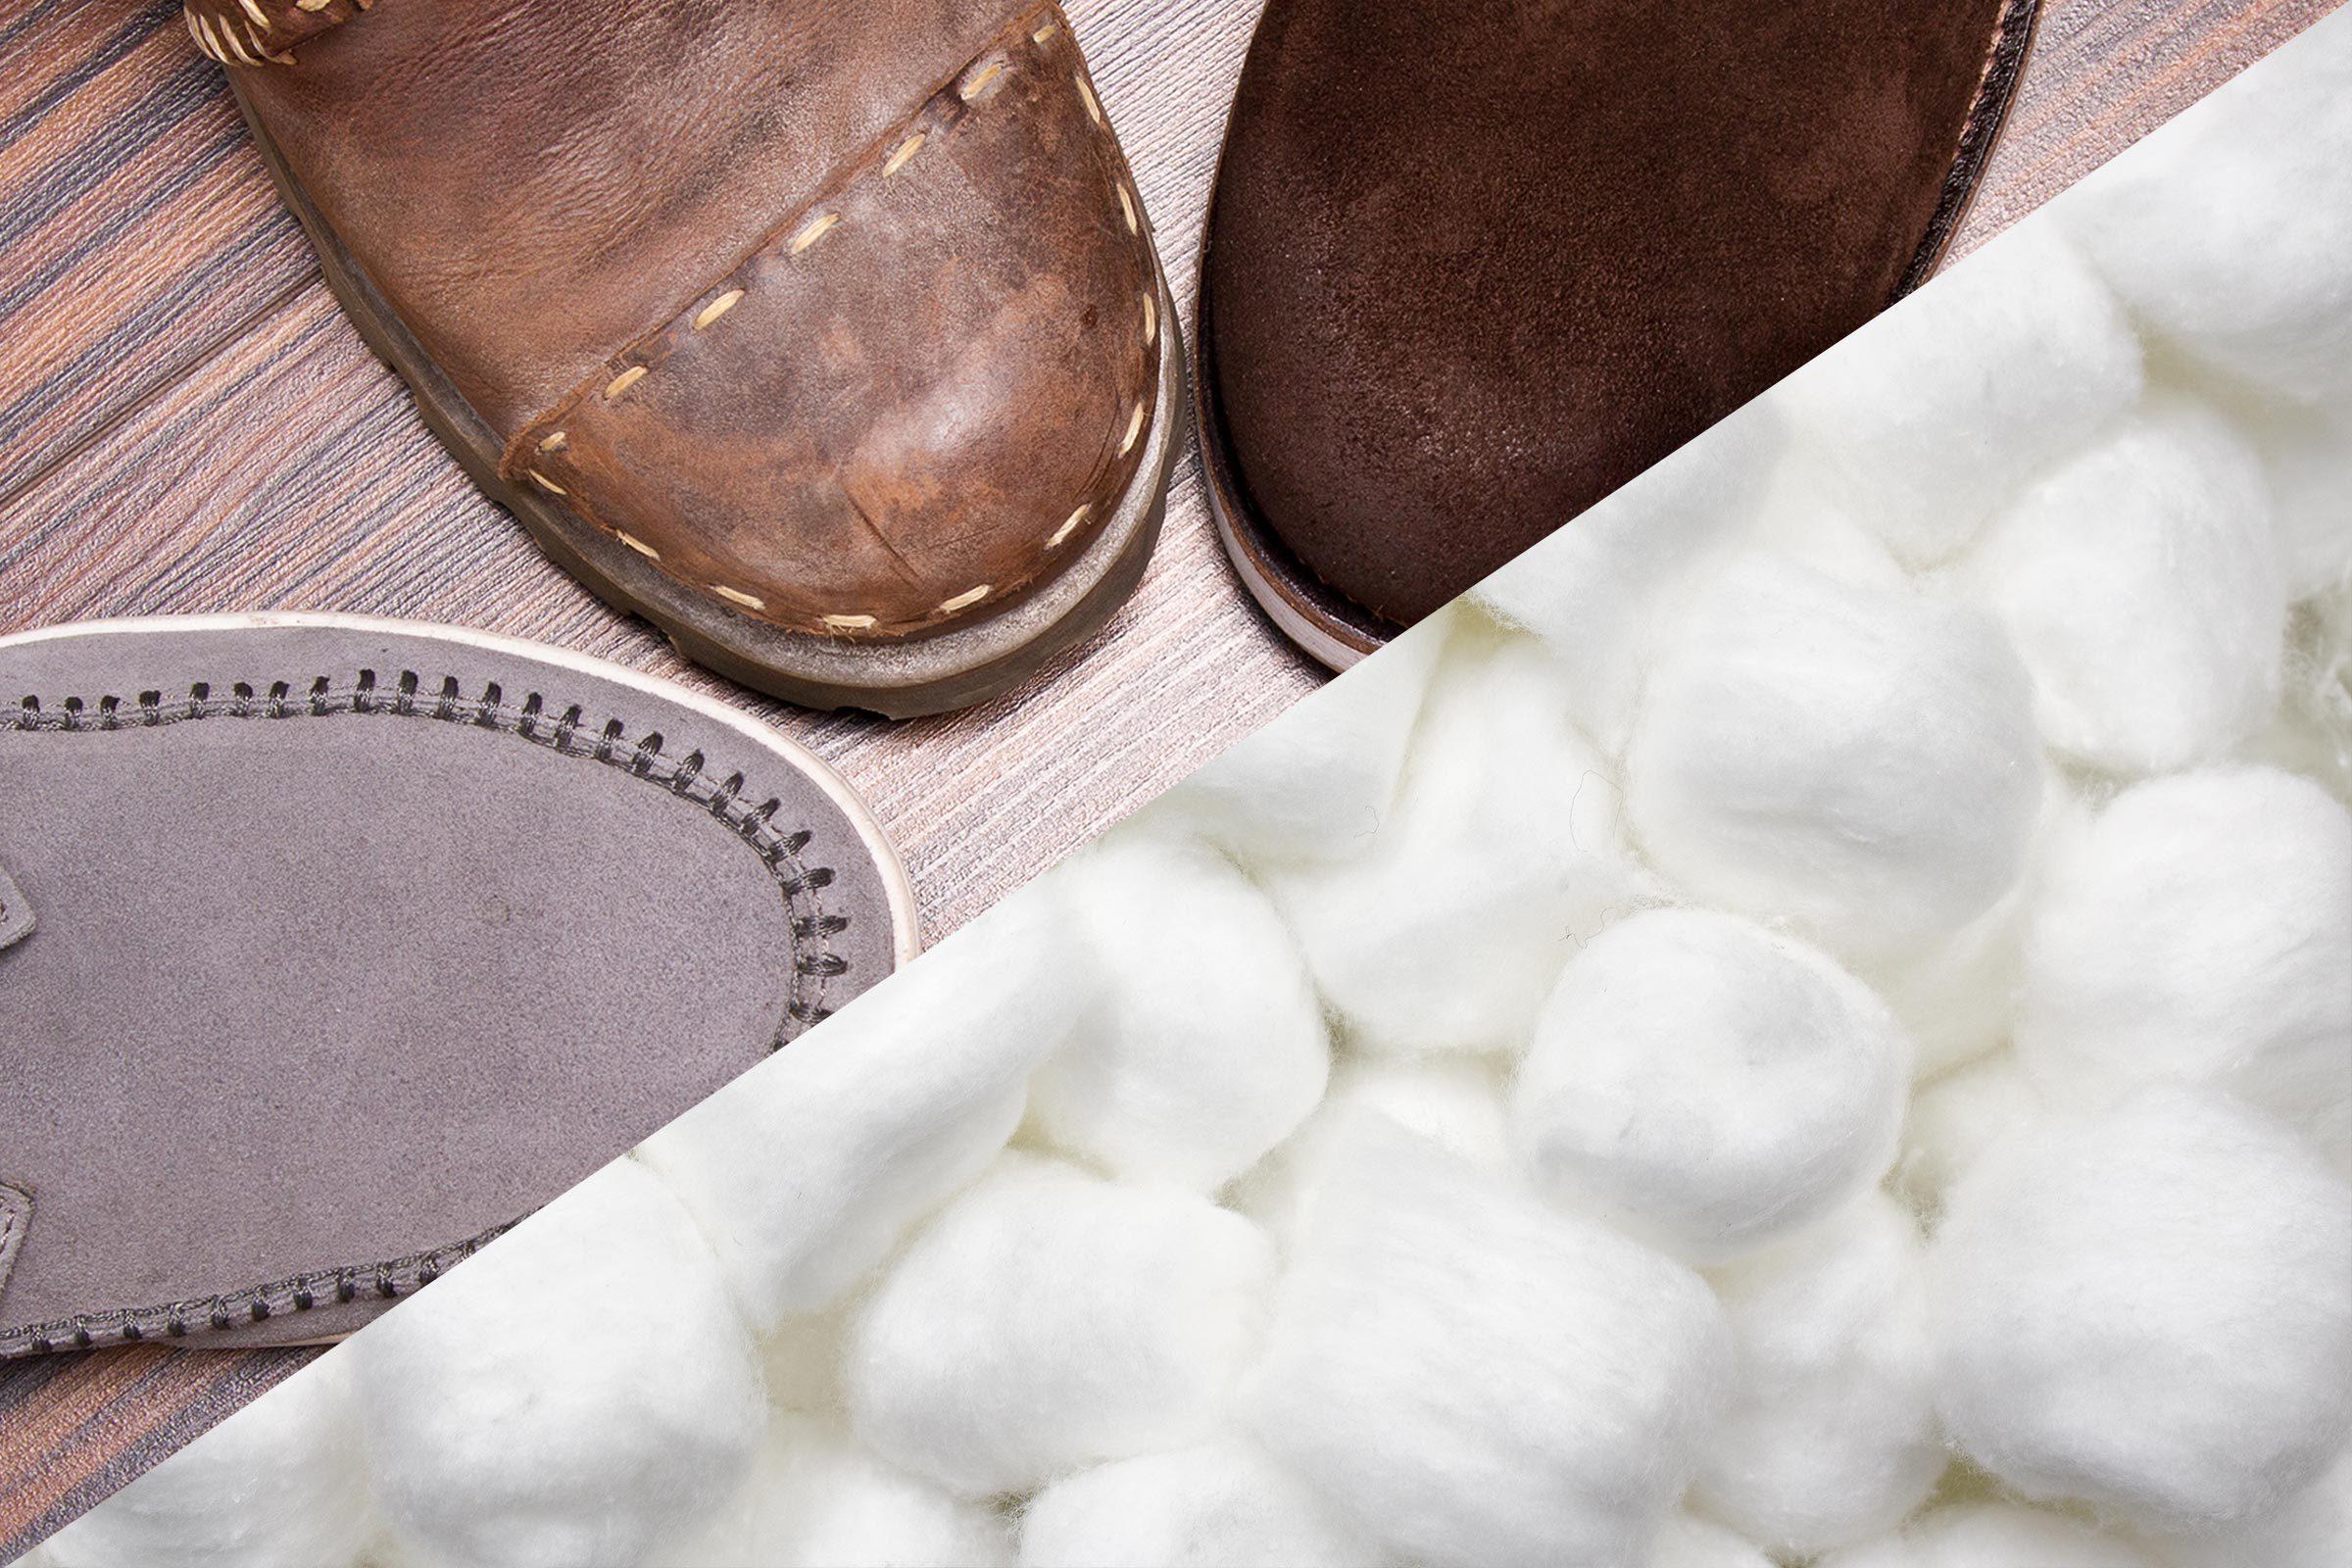 Prevent blisters